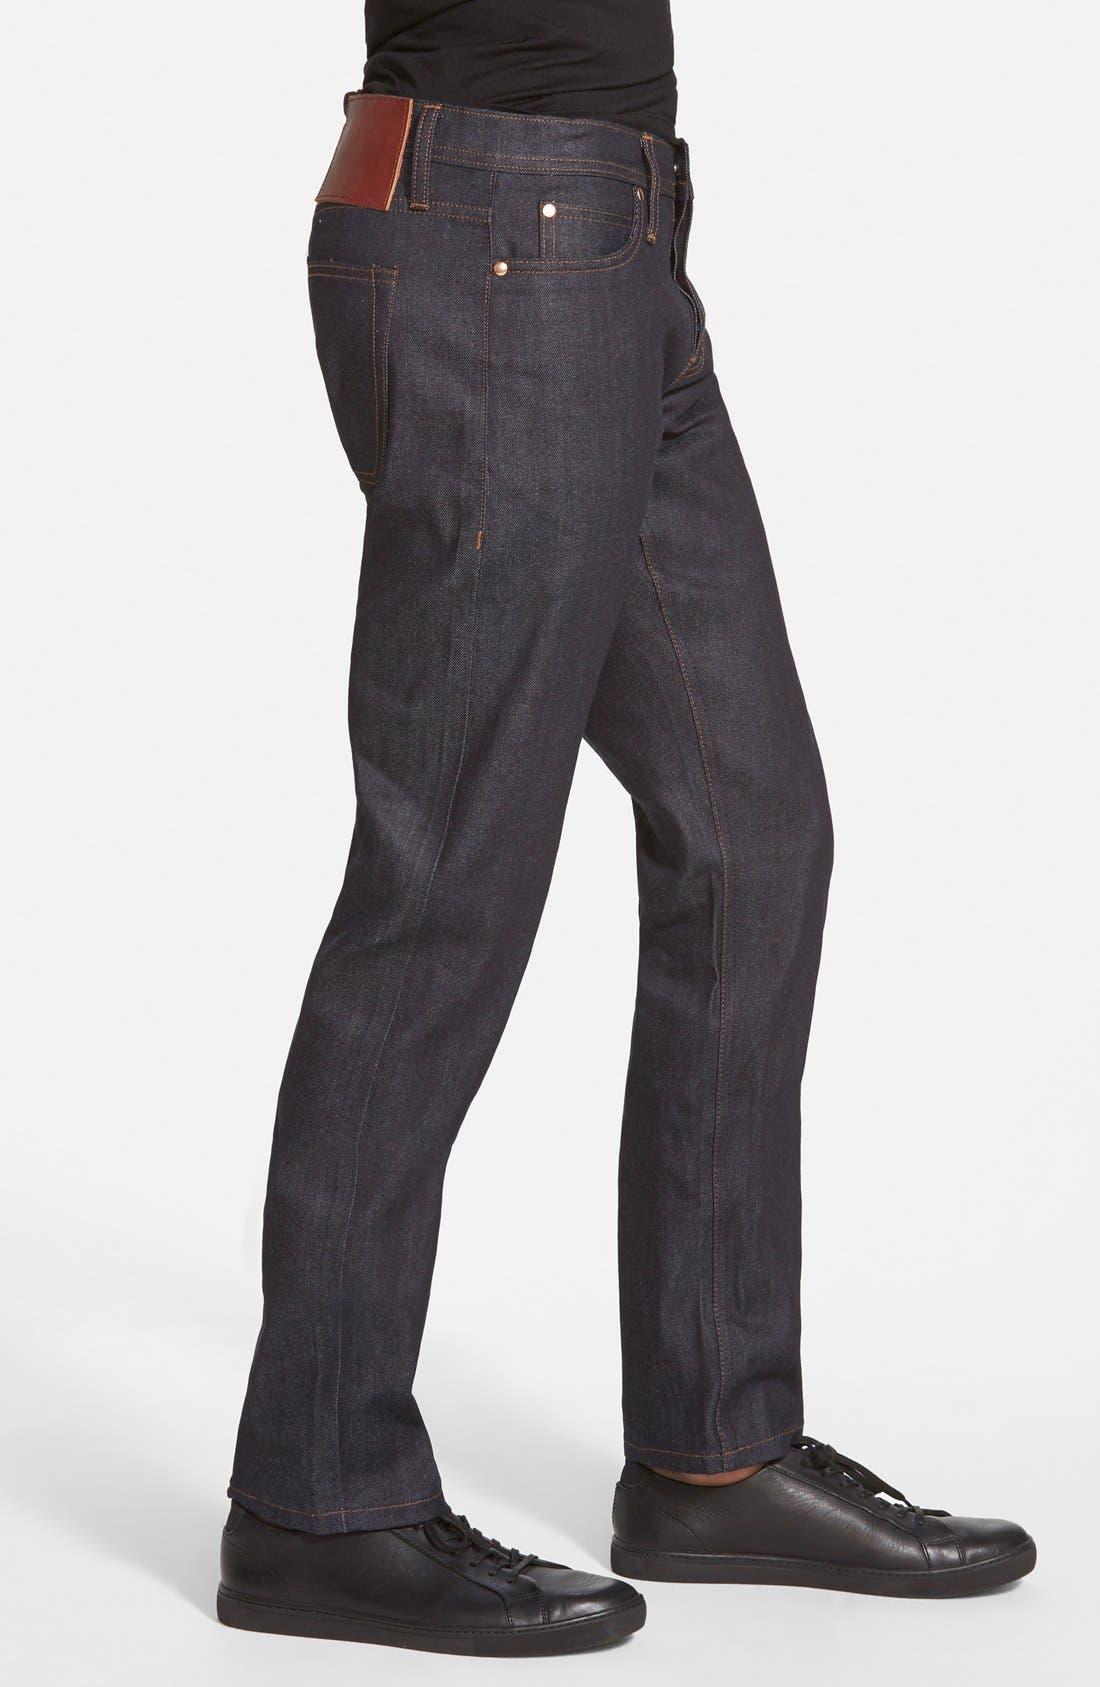 'UB122' Skinny Fit Raw Selvedge Jeans,                             Alternate thumbnail 2, color,                             401